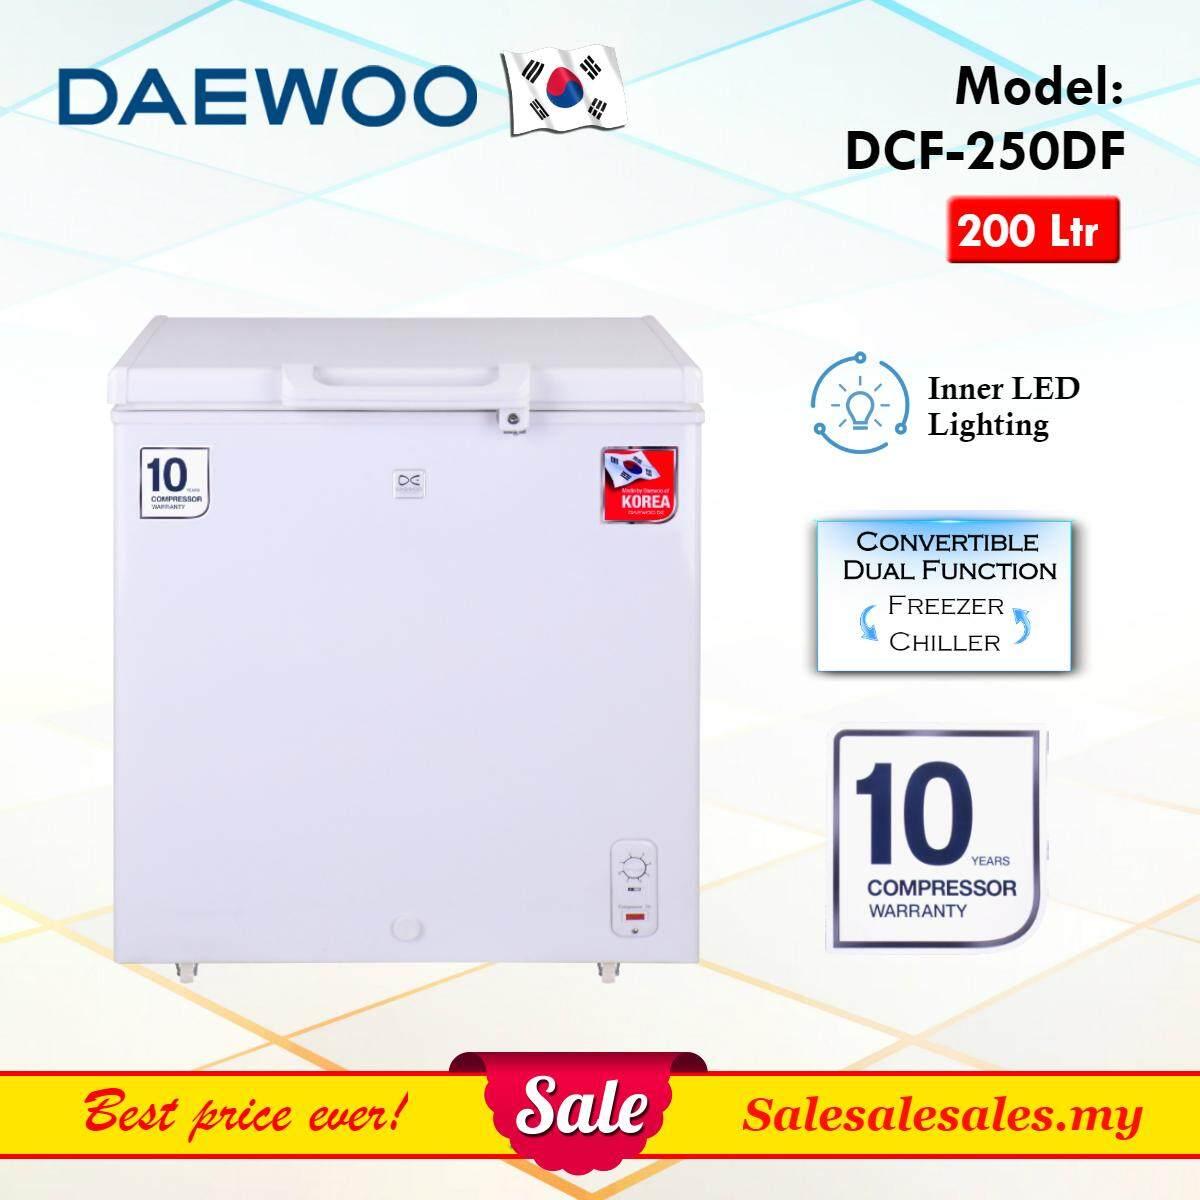 Daewoo Korea DCF-250DF Chest Freezer 200L (Net 186L) Peti Beku Dual Function *10YEAR WRTY*